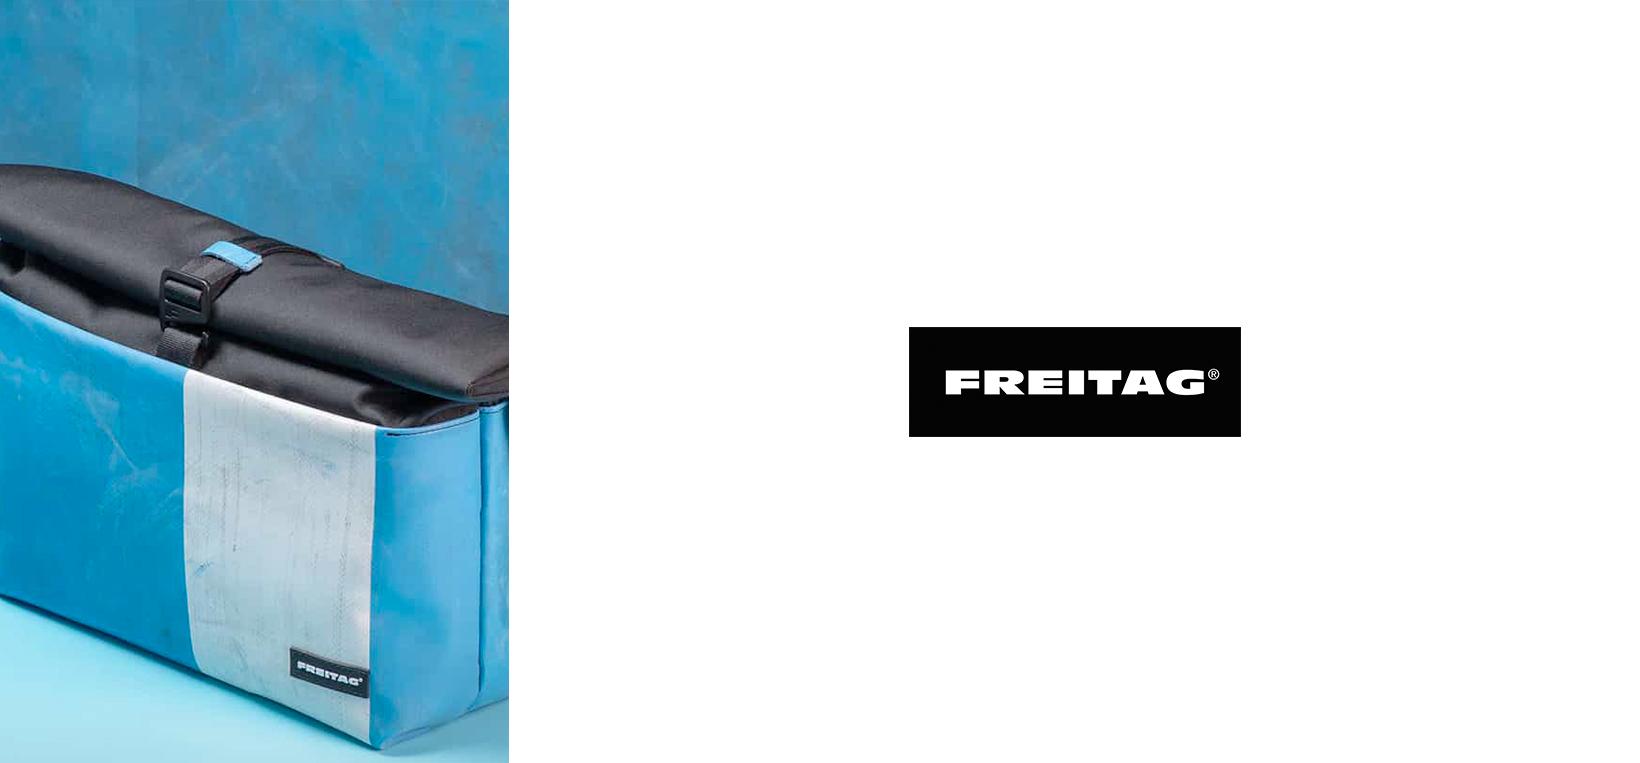 FREITAG - Uomo - Leam Roma